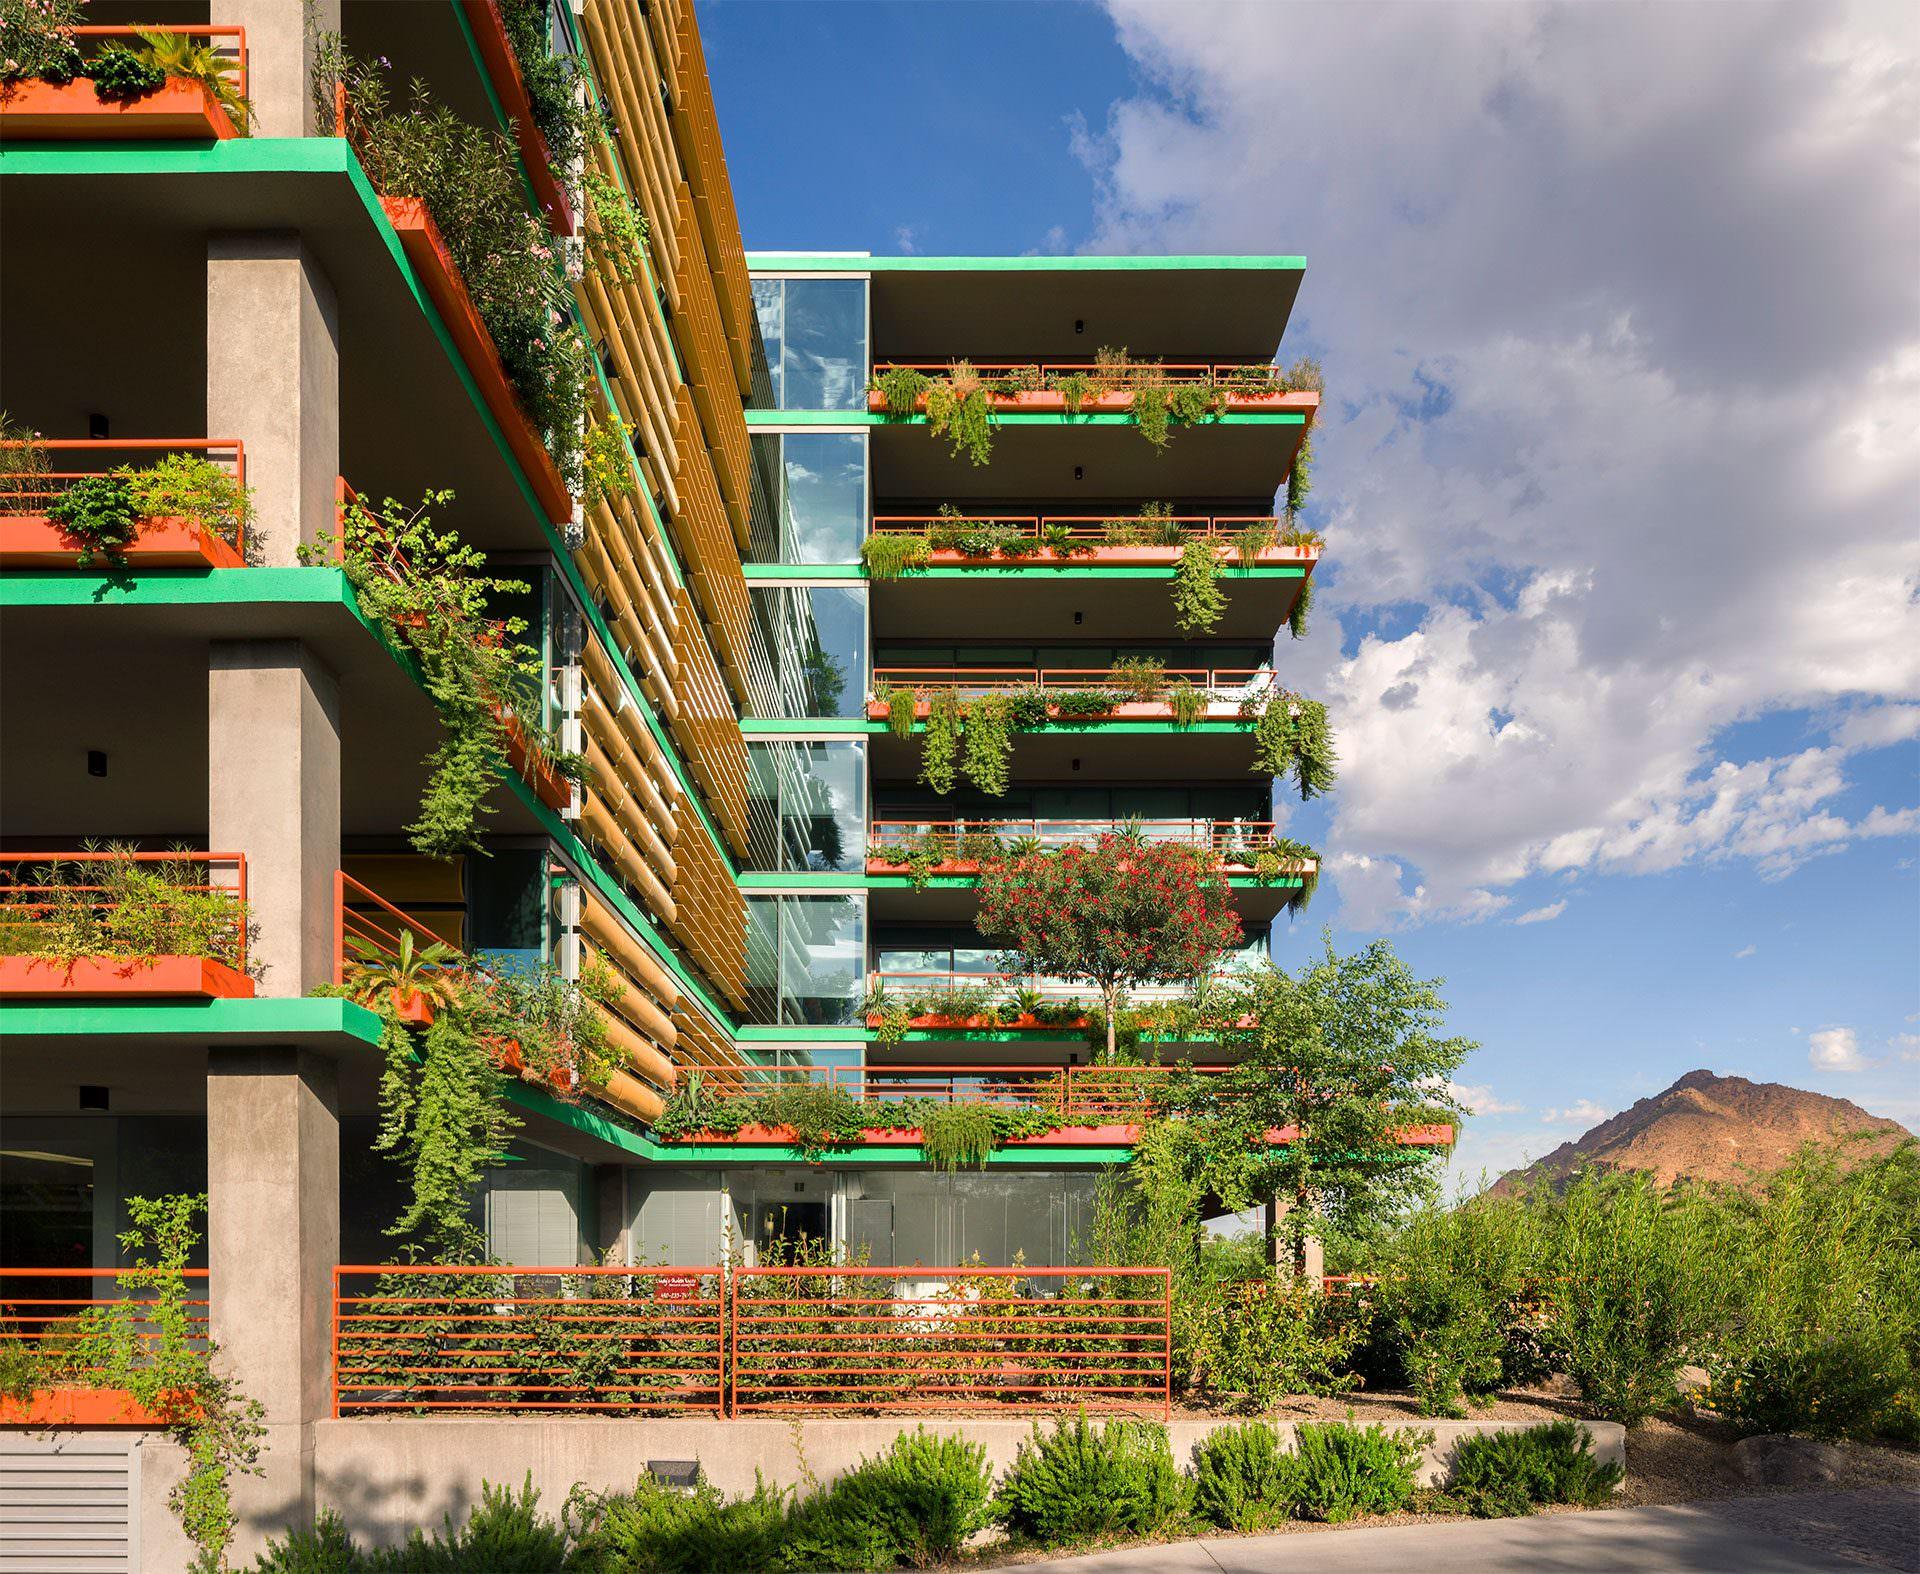 Optima Sonoran Village vertical landscaping system